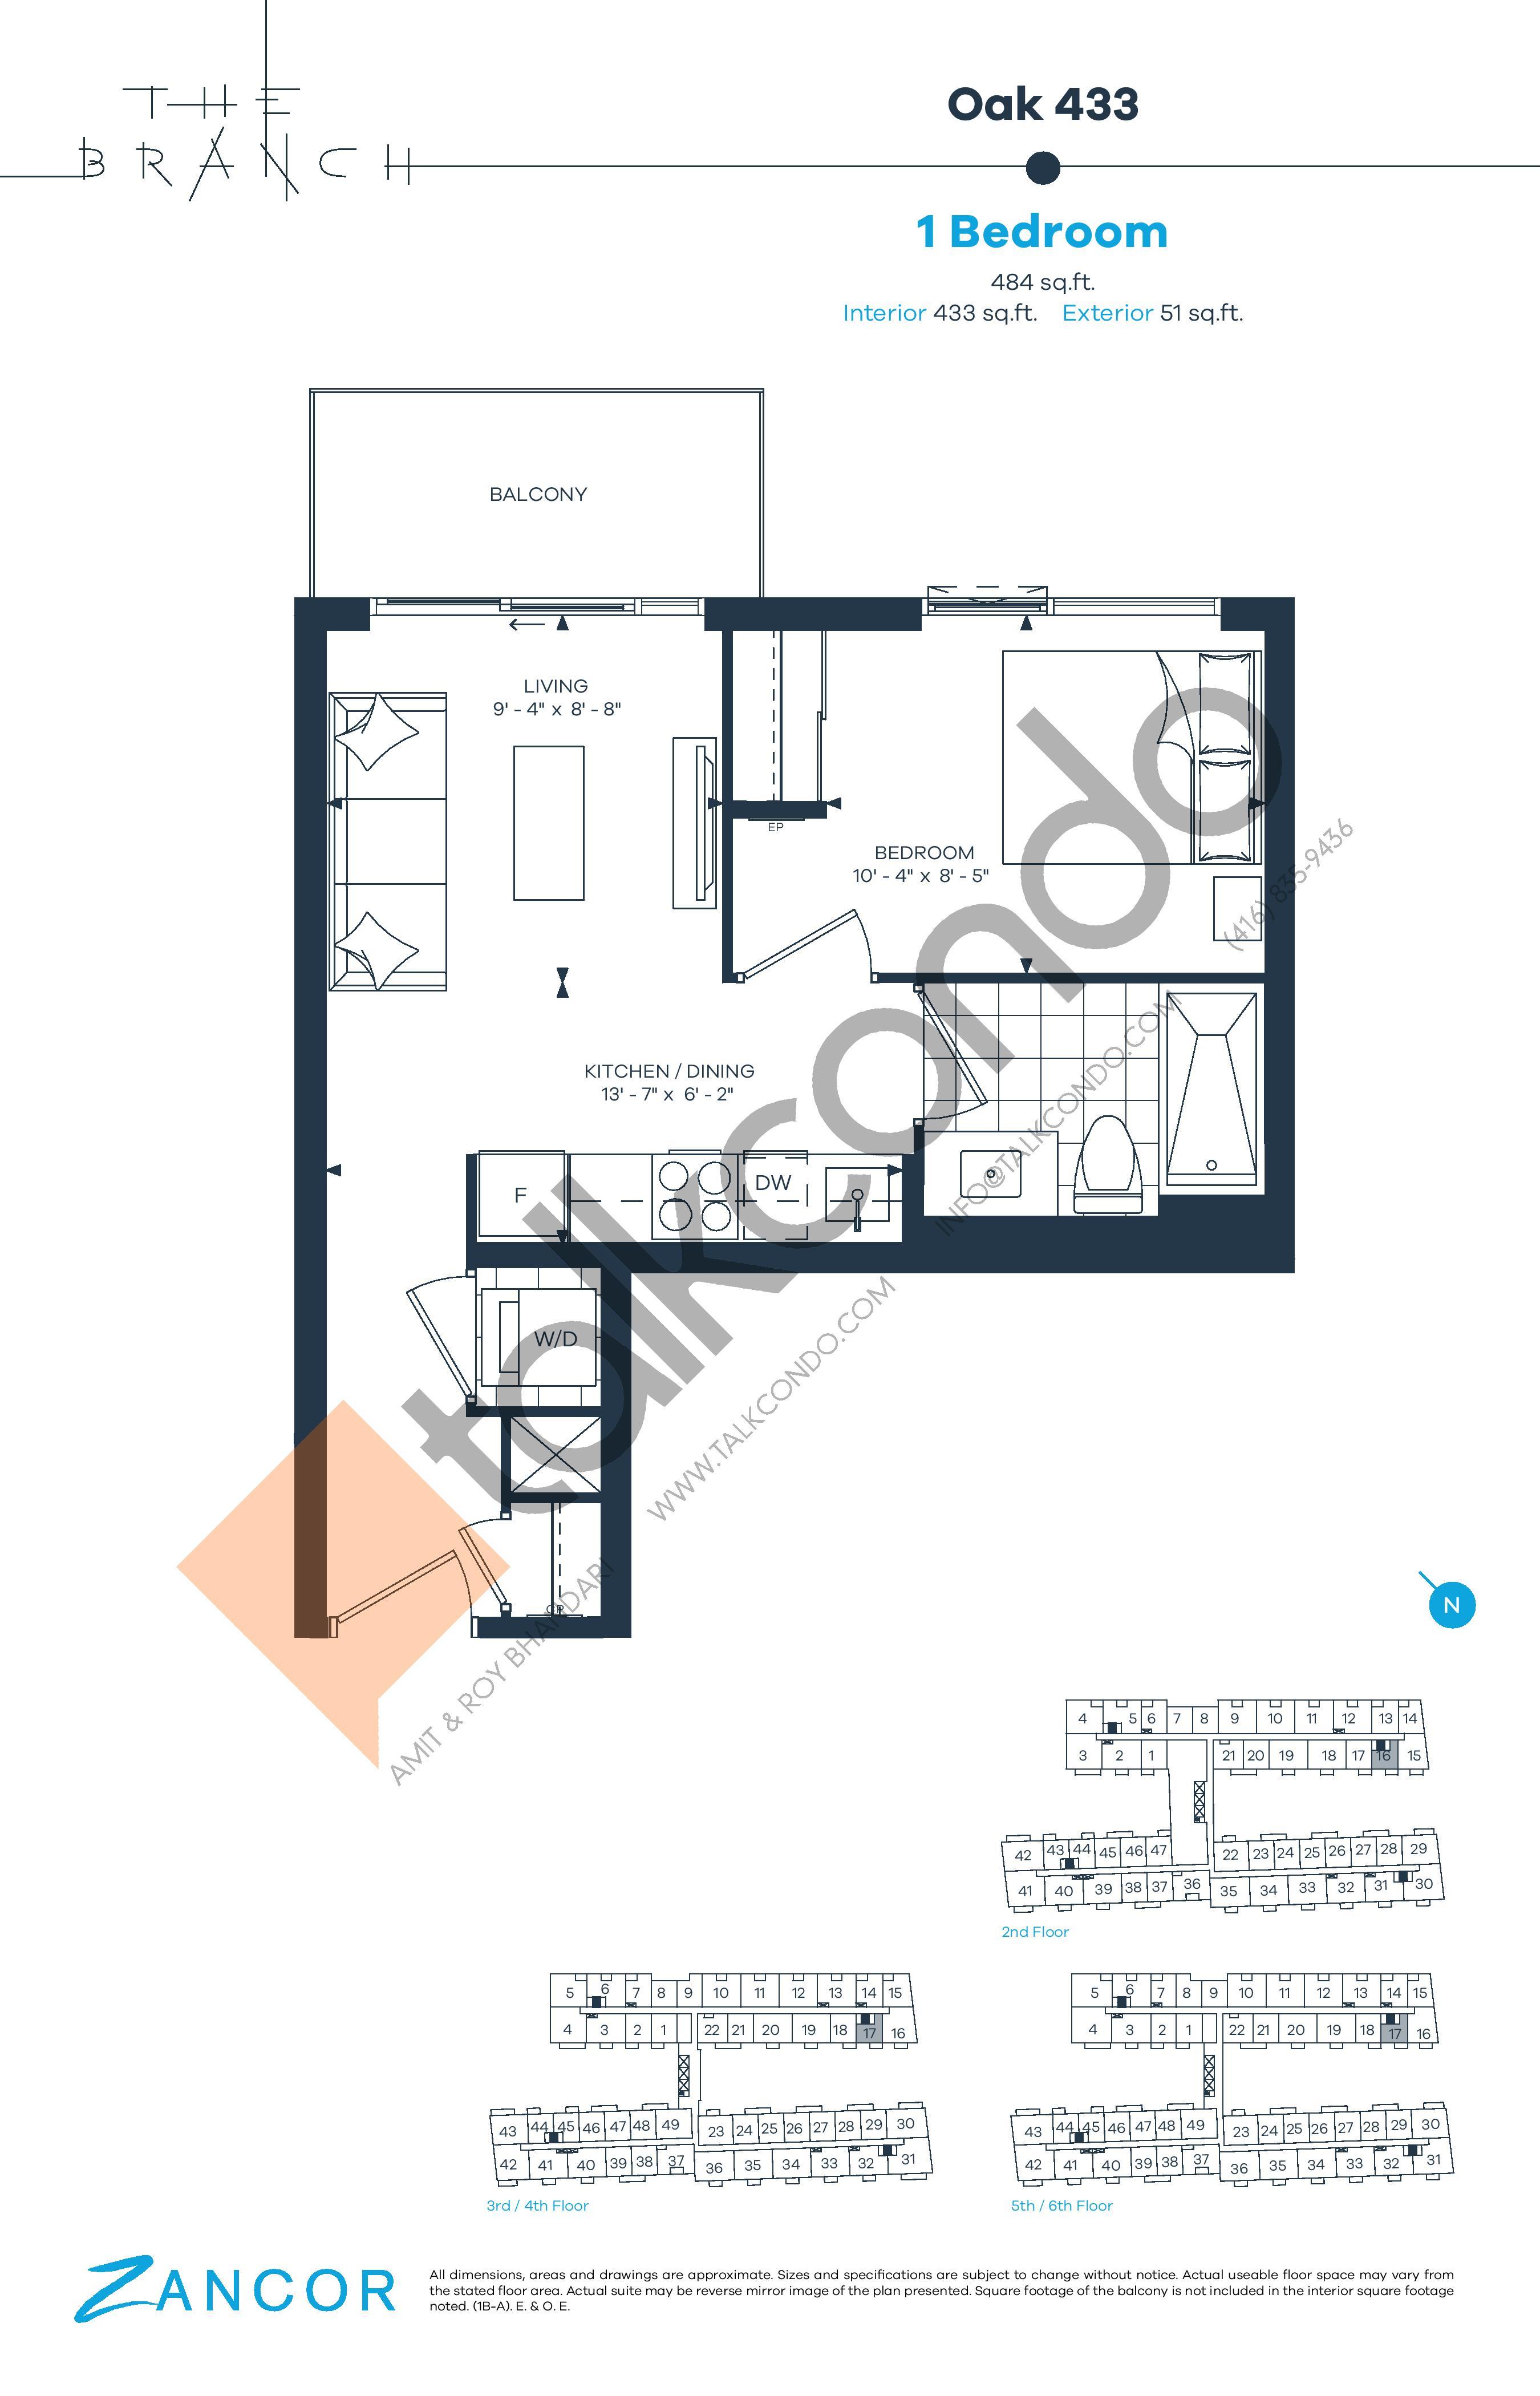 Oak 433 Floor Plan at The Branch Condos - 433 sq.ft